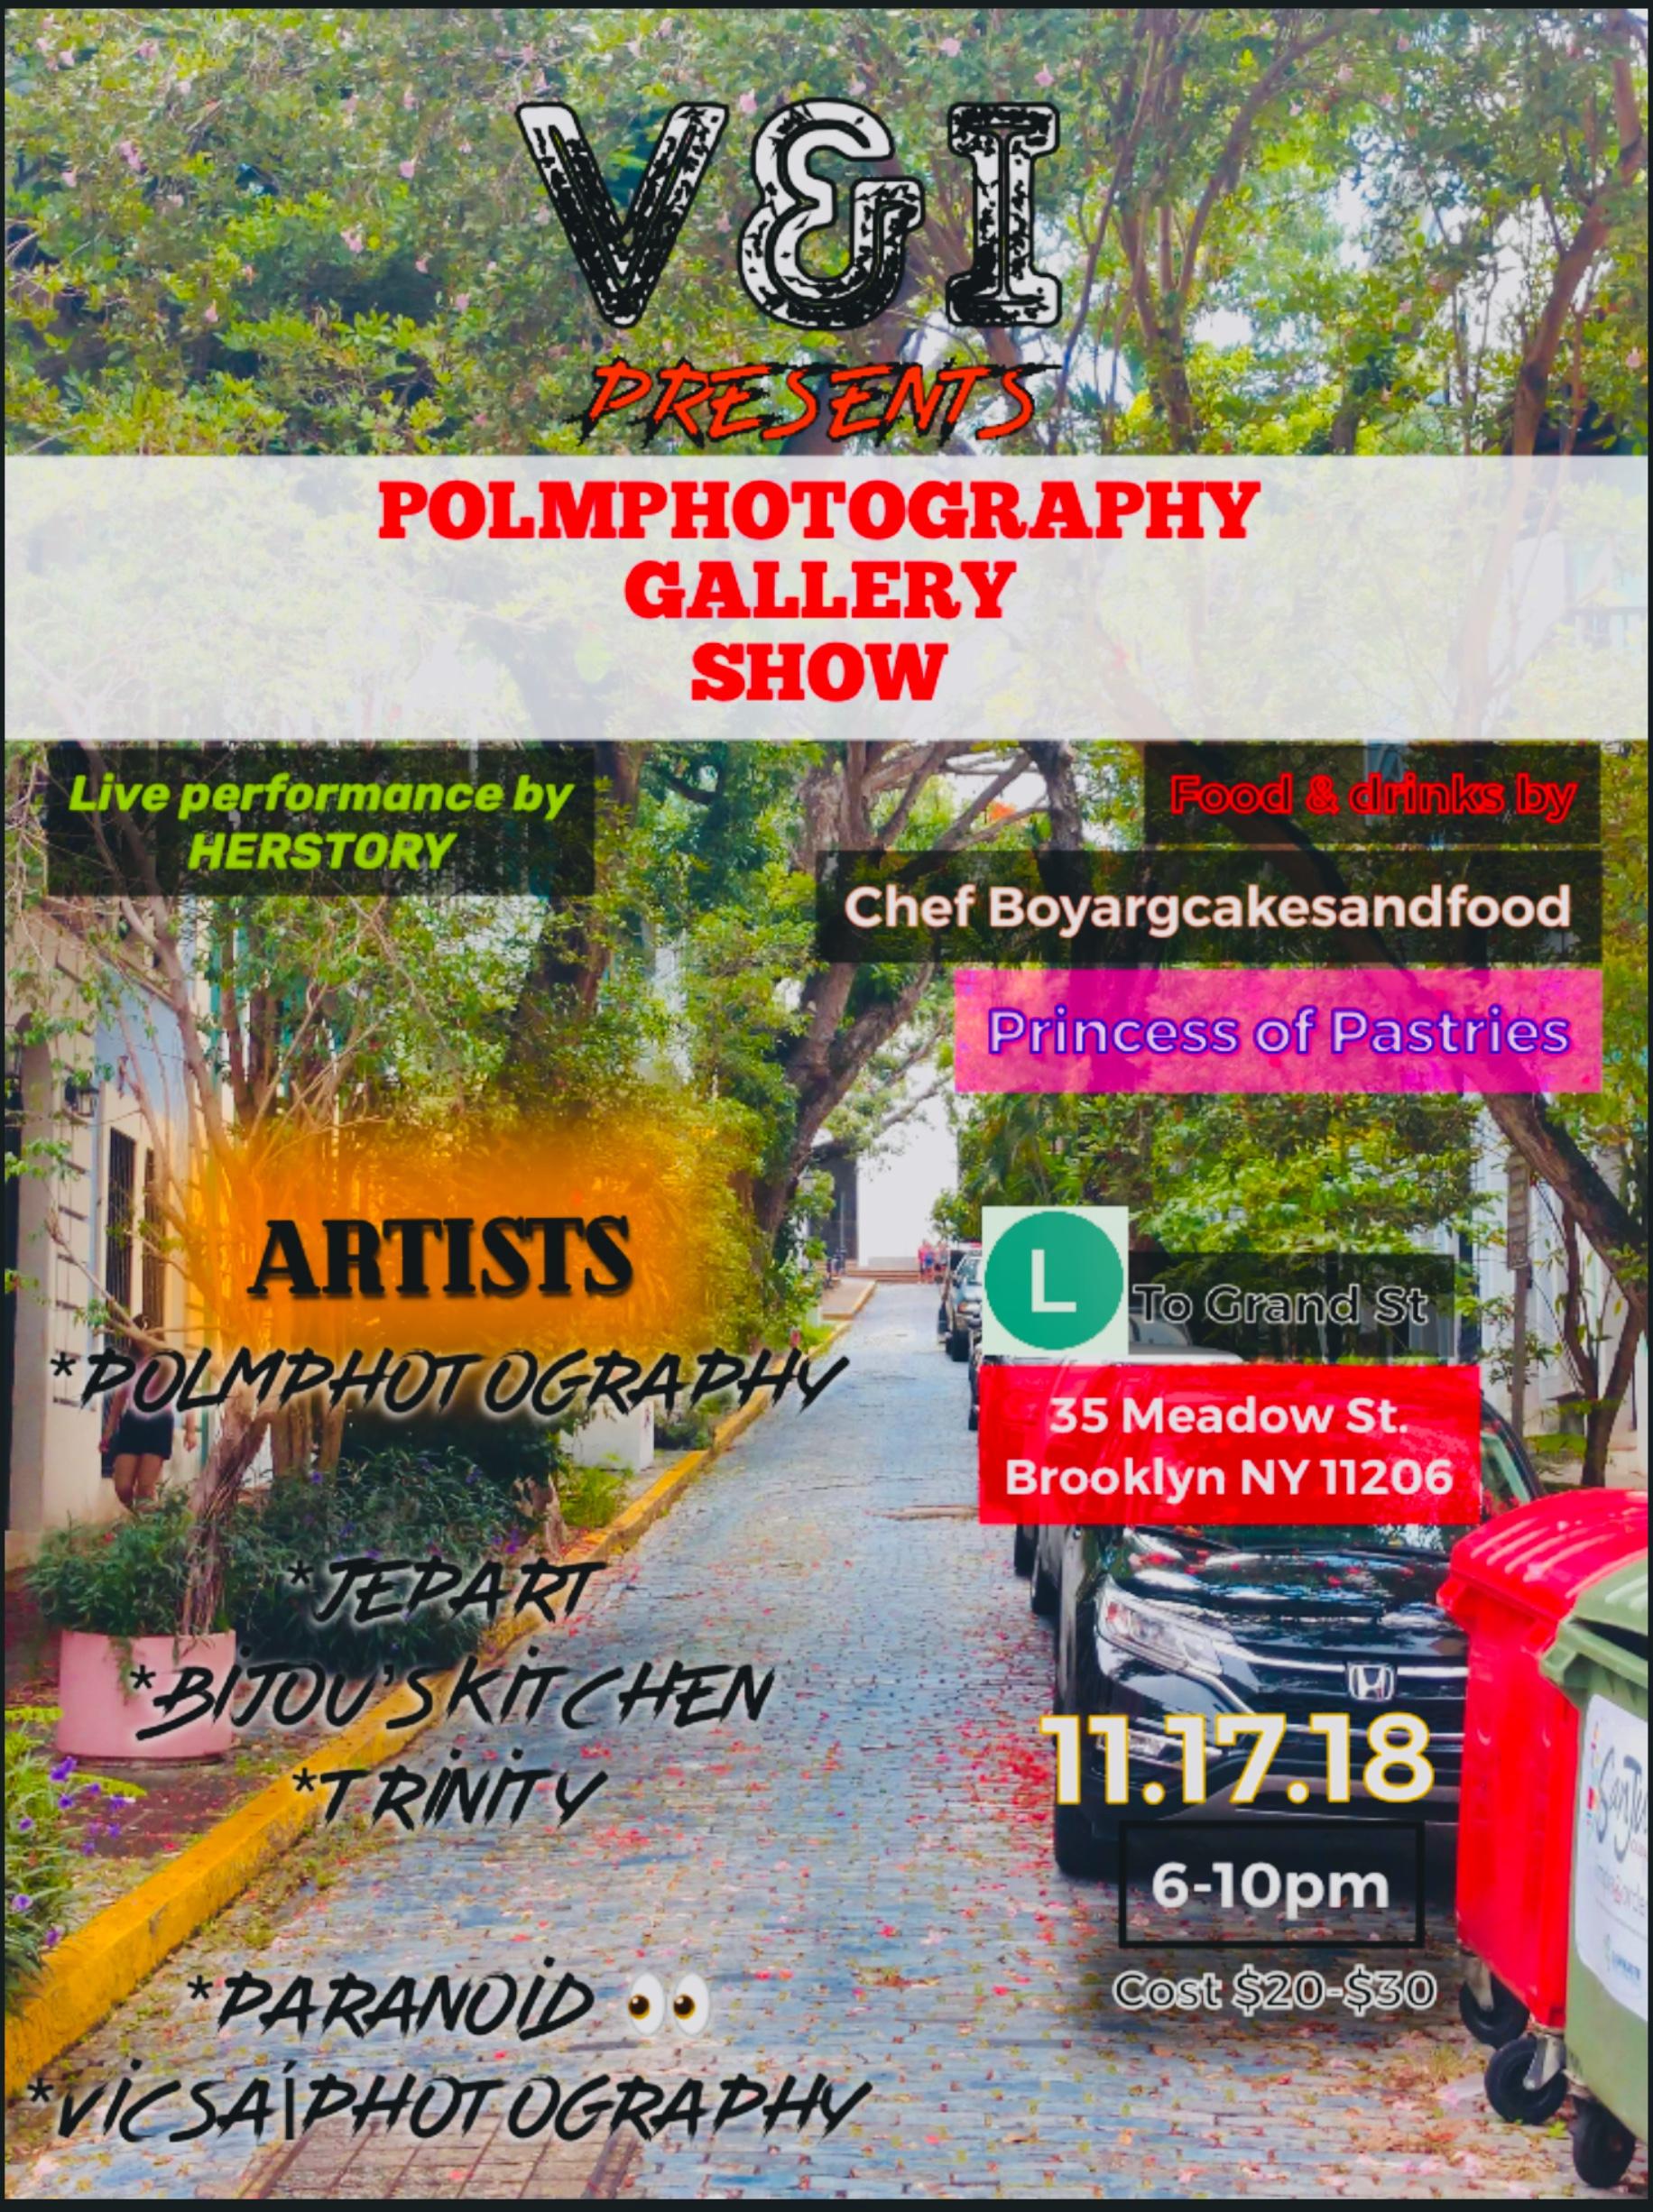 https://www.eventbrite.com/e/vi-polm-photography-gallery-show-tickets-49960363793